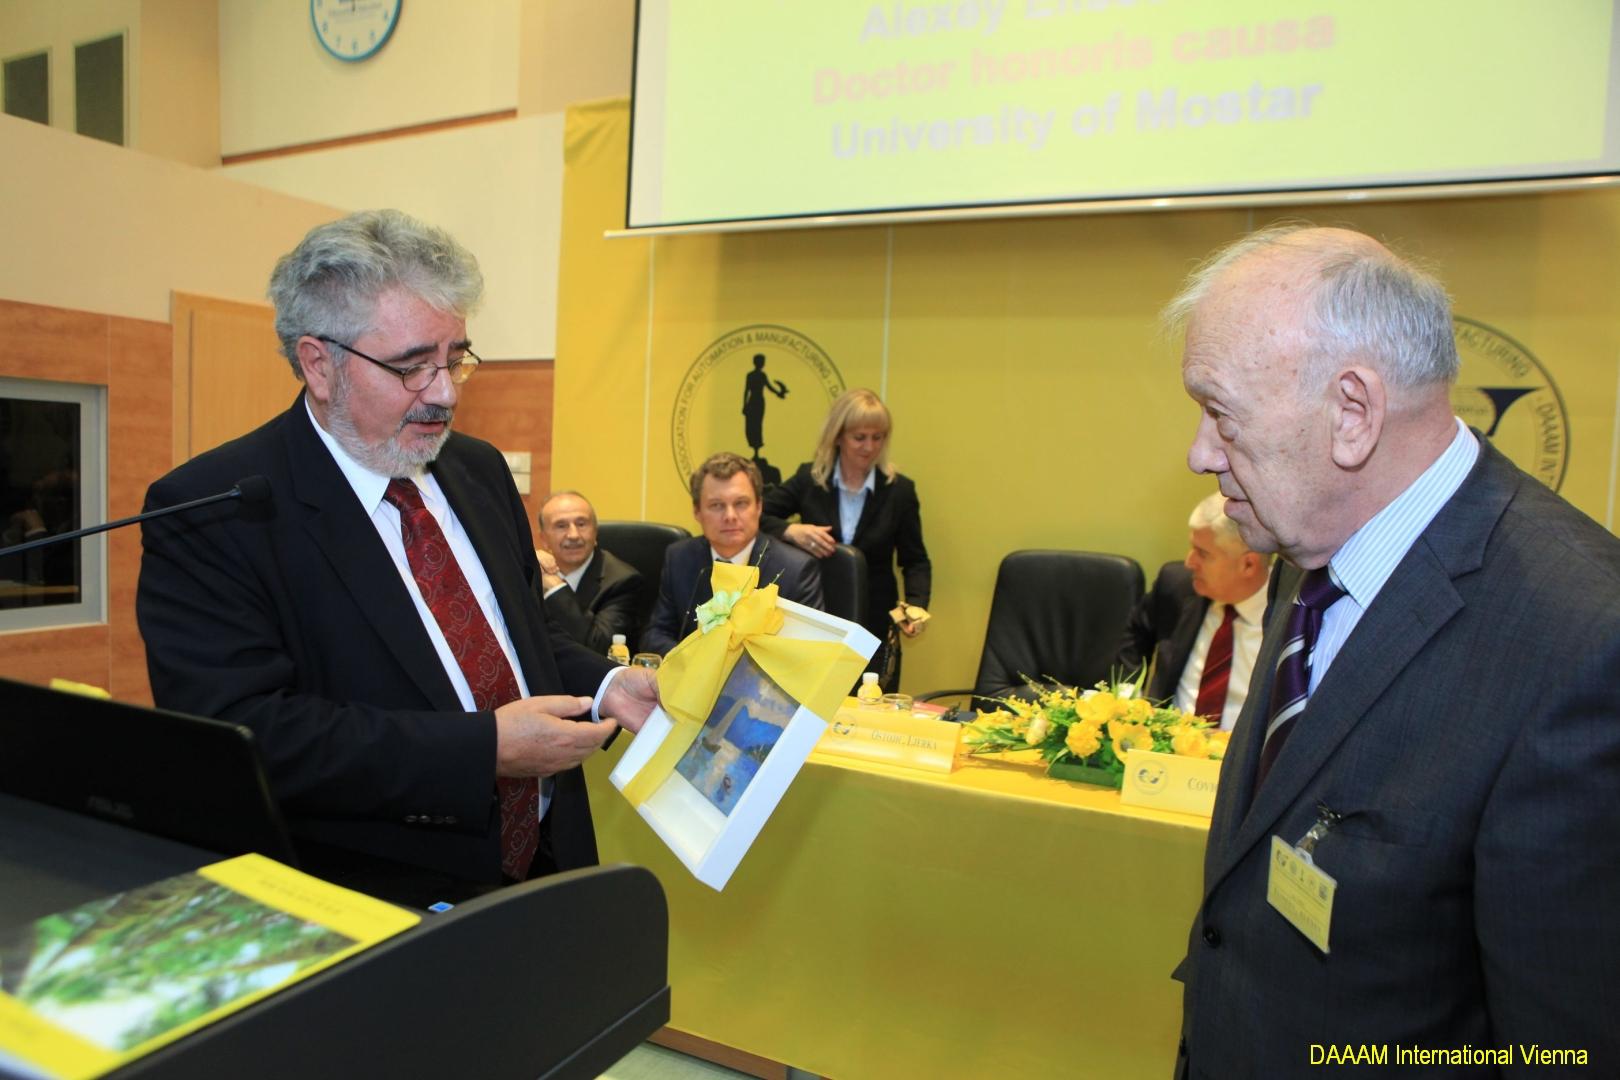 DAAAM_2016_Mostar_06_Professor_and_Cosmonaut_Alexey_Eliseev_Doctor_honors_causa_022